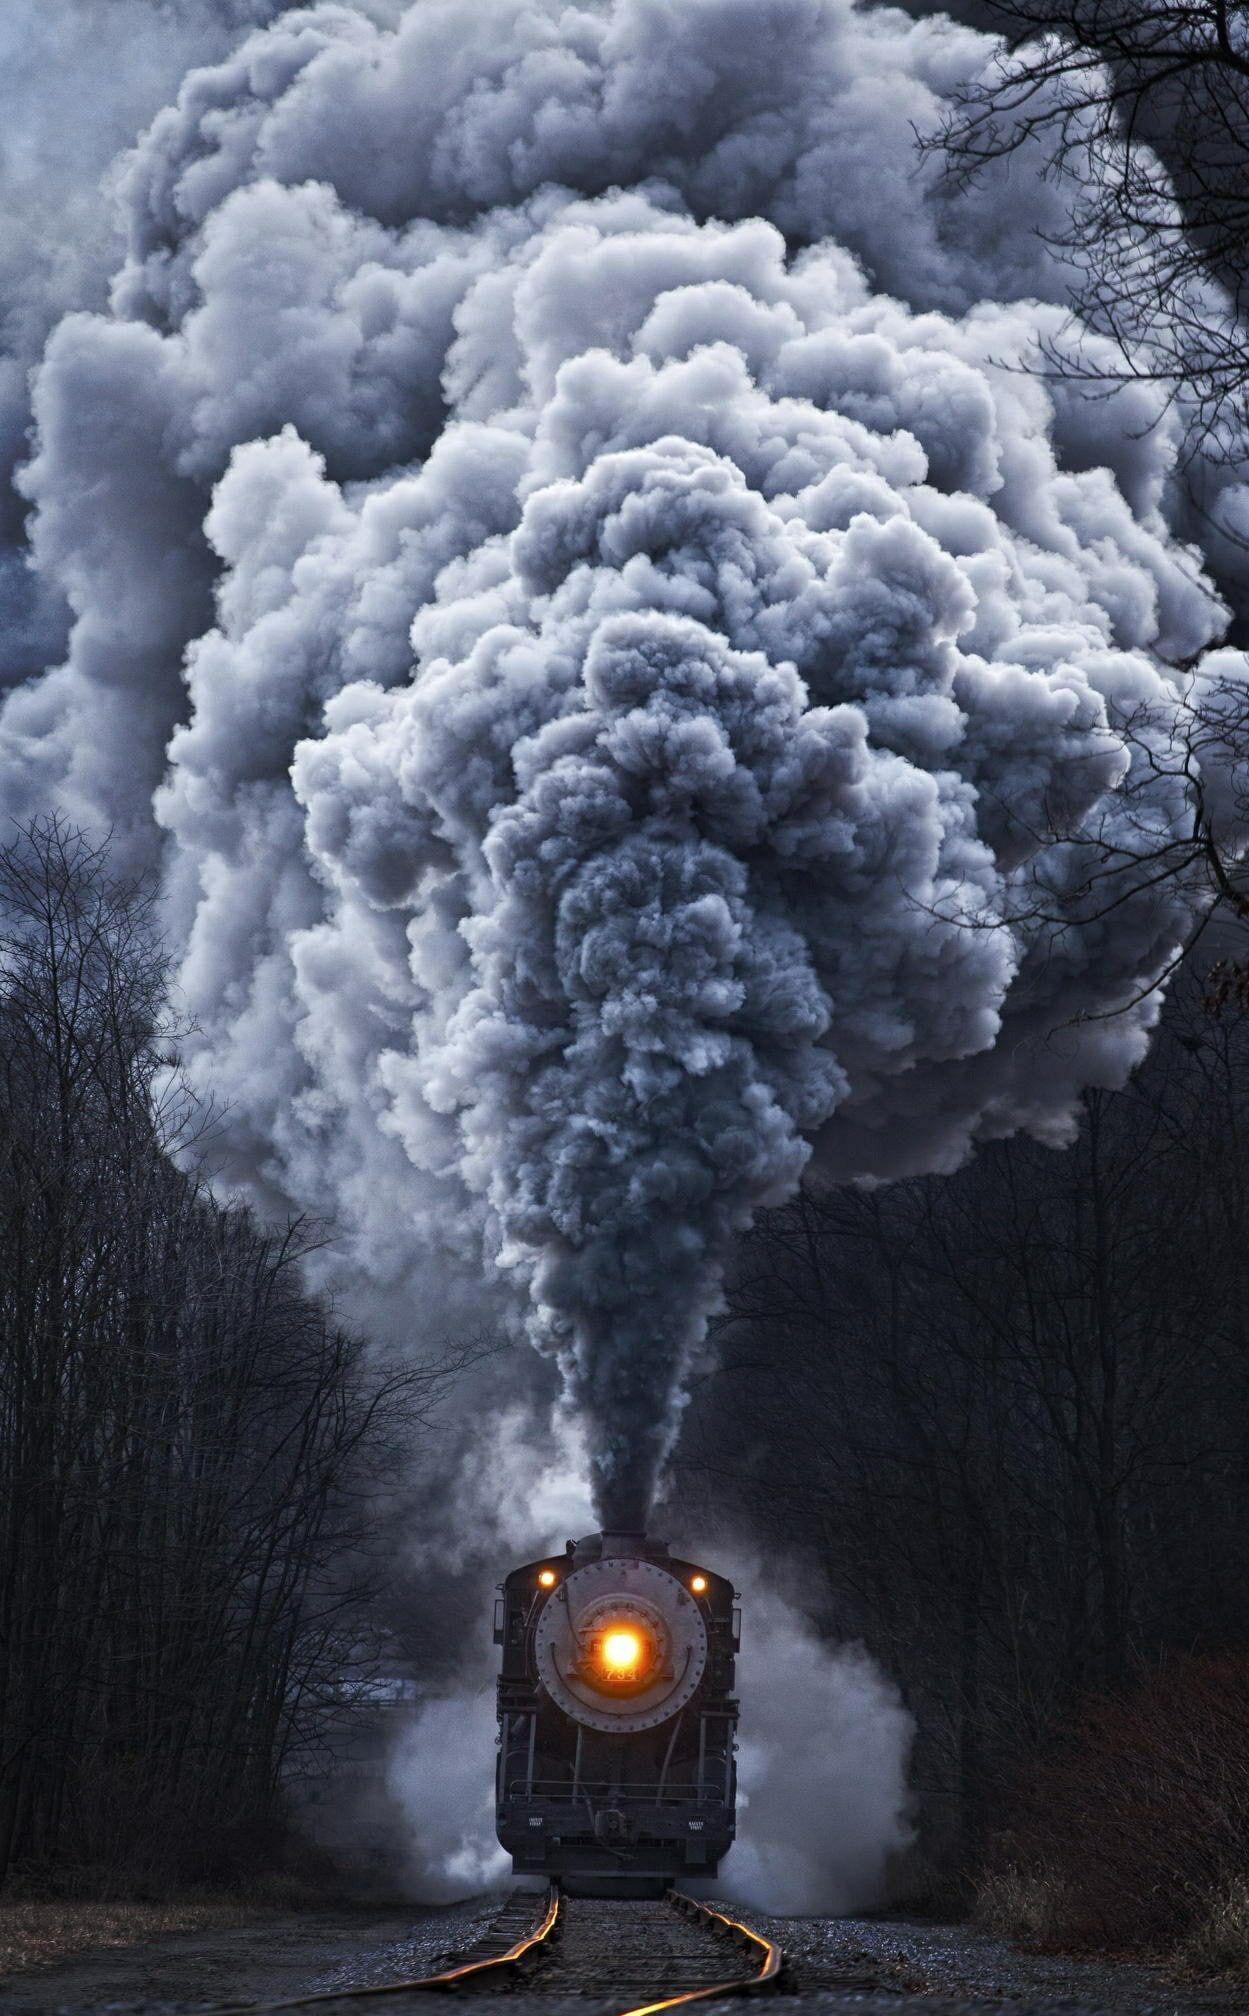 nature train portrait display steam 1080P